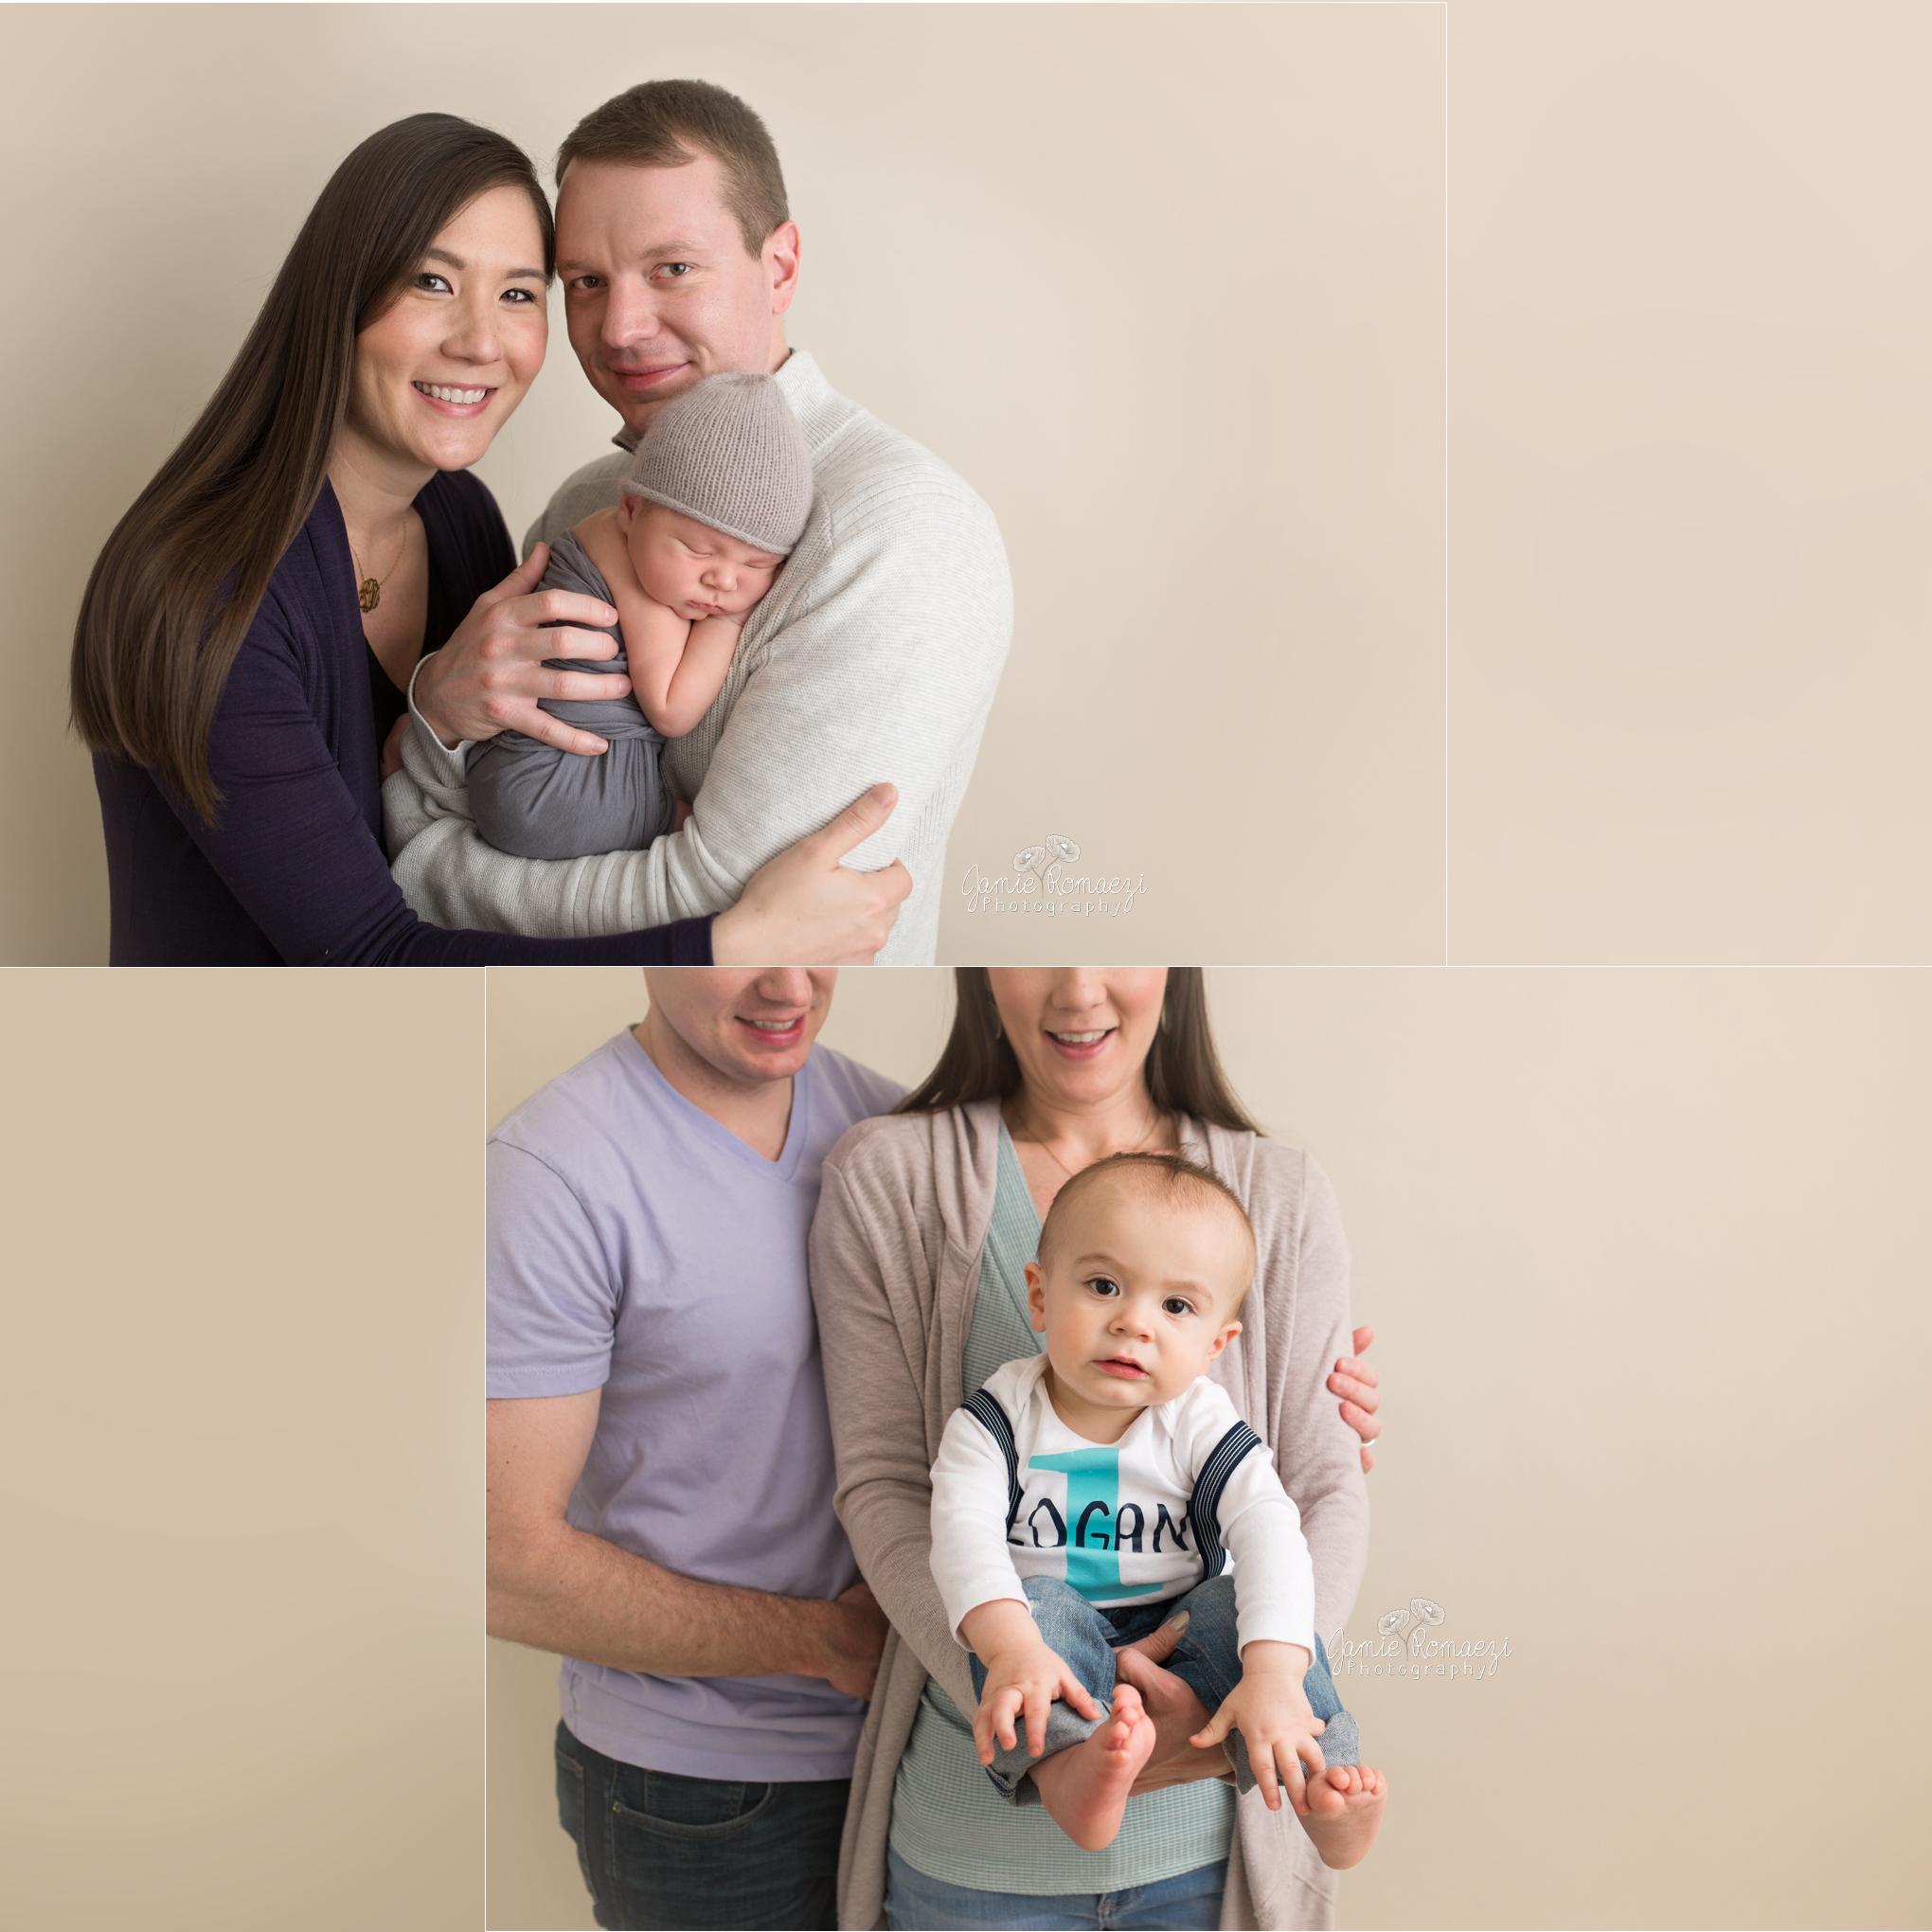 Newborn versus 1 Year